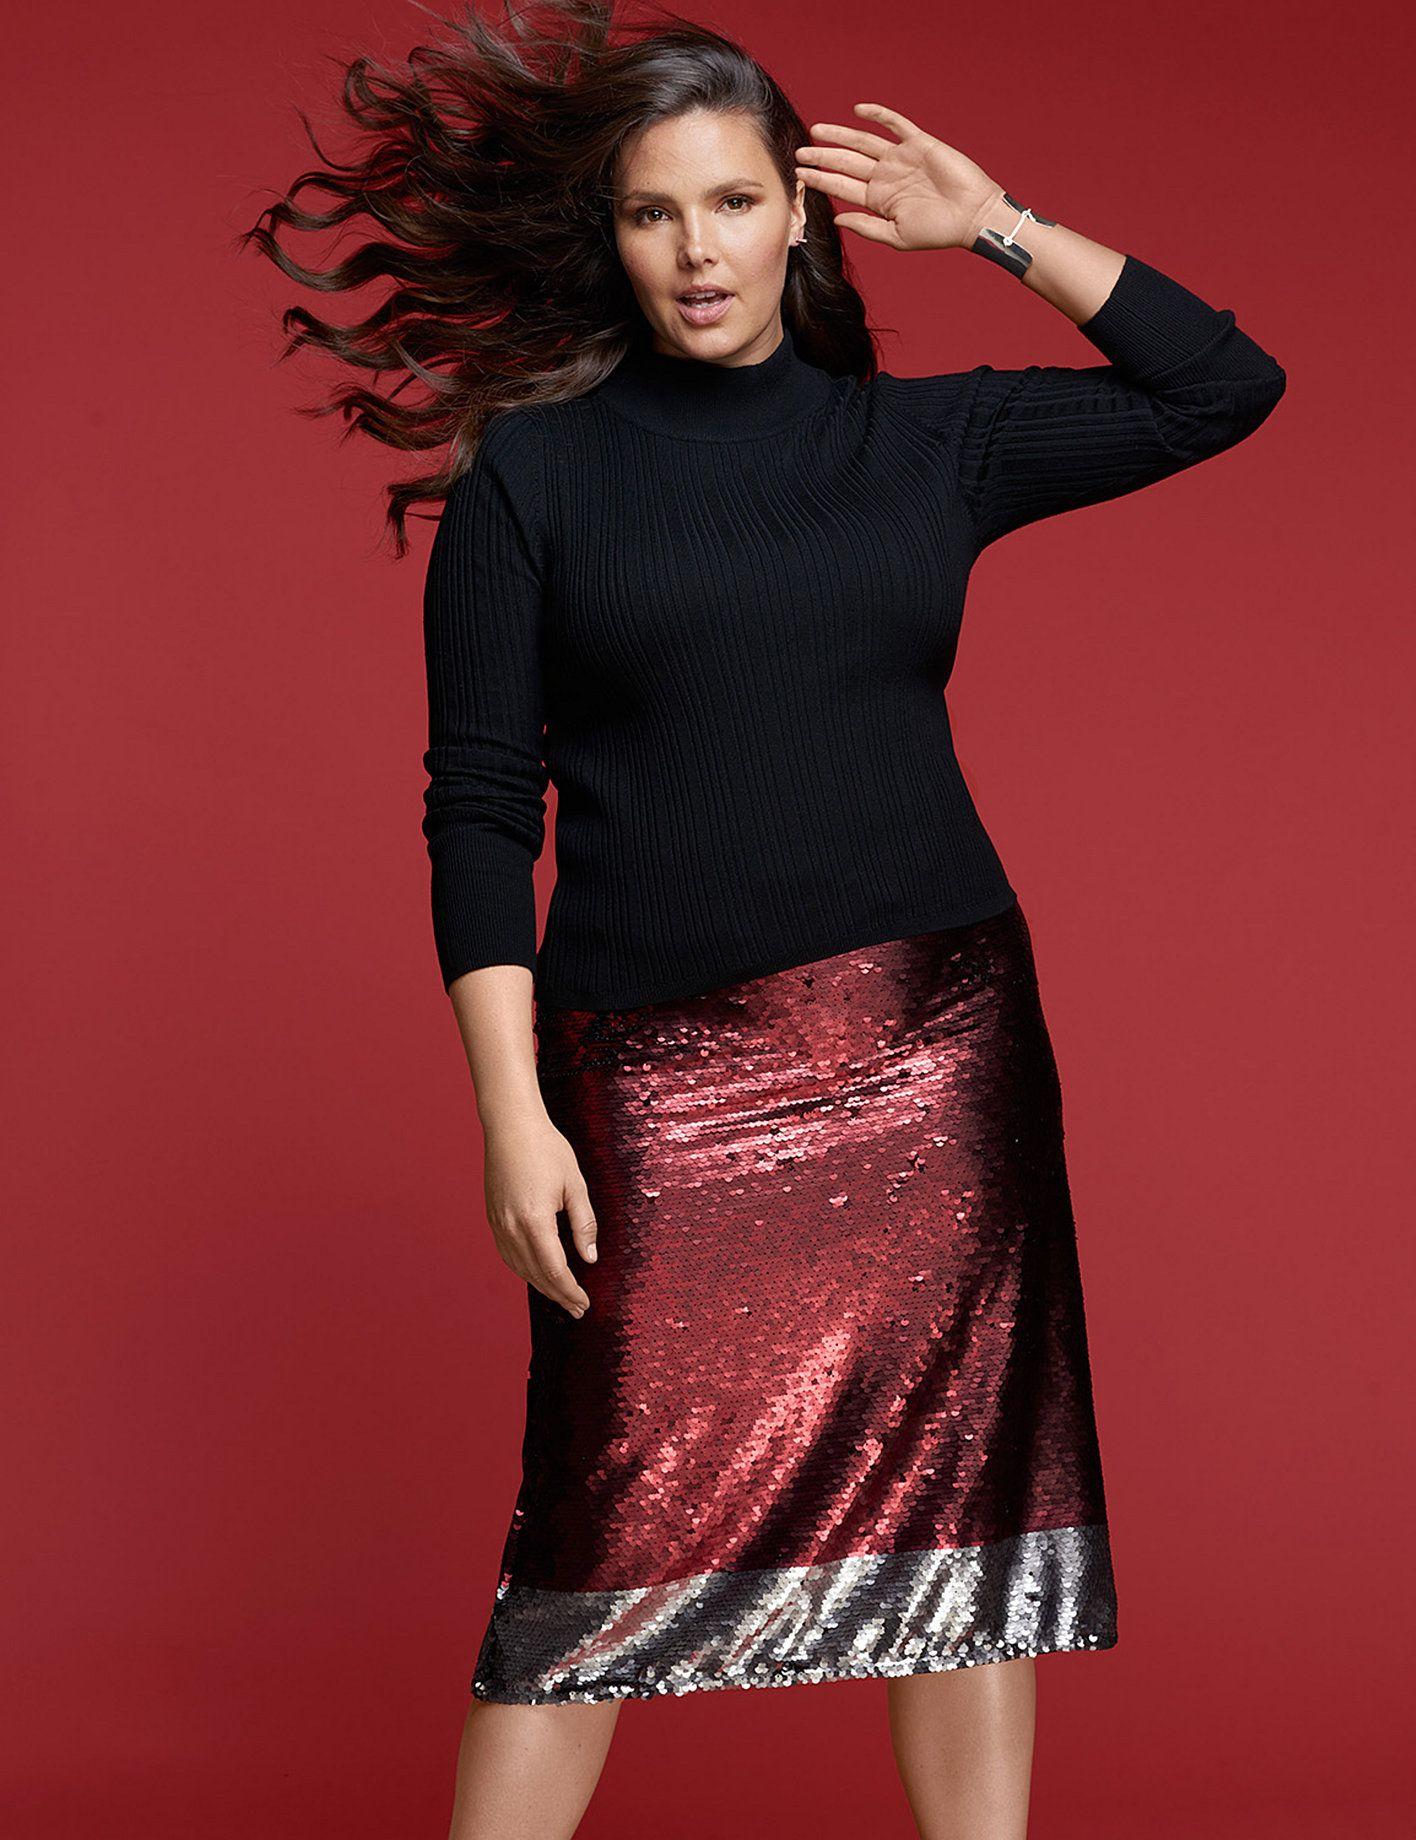 e44df311115 Clearance Plus Size Womens Dresses   Skirts Sale